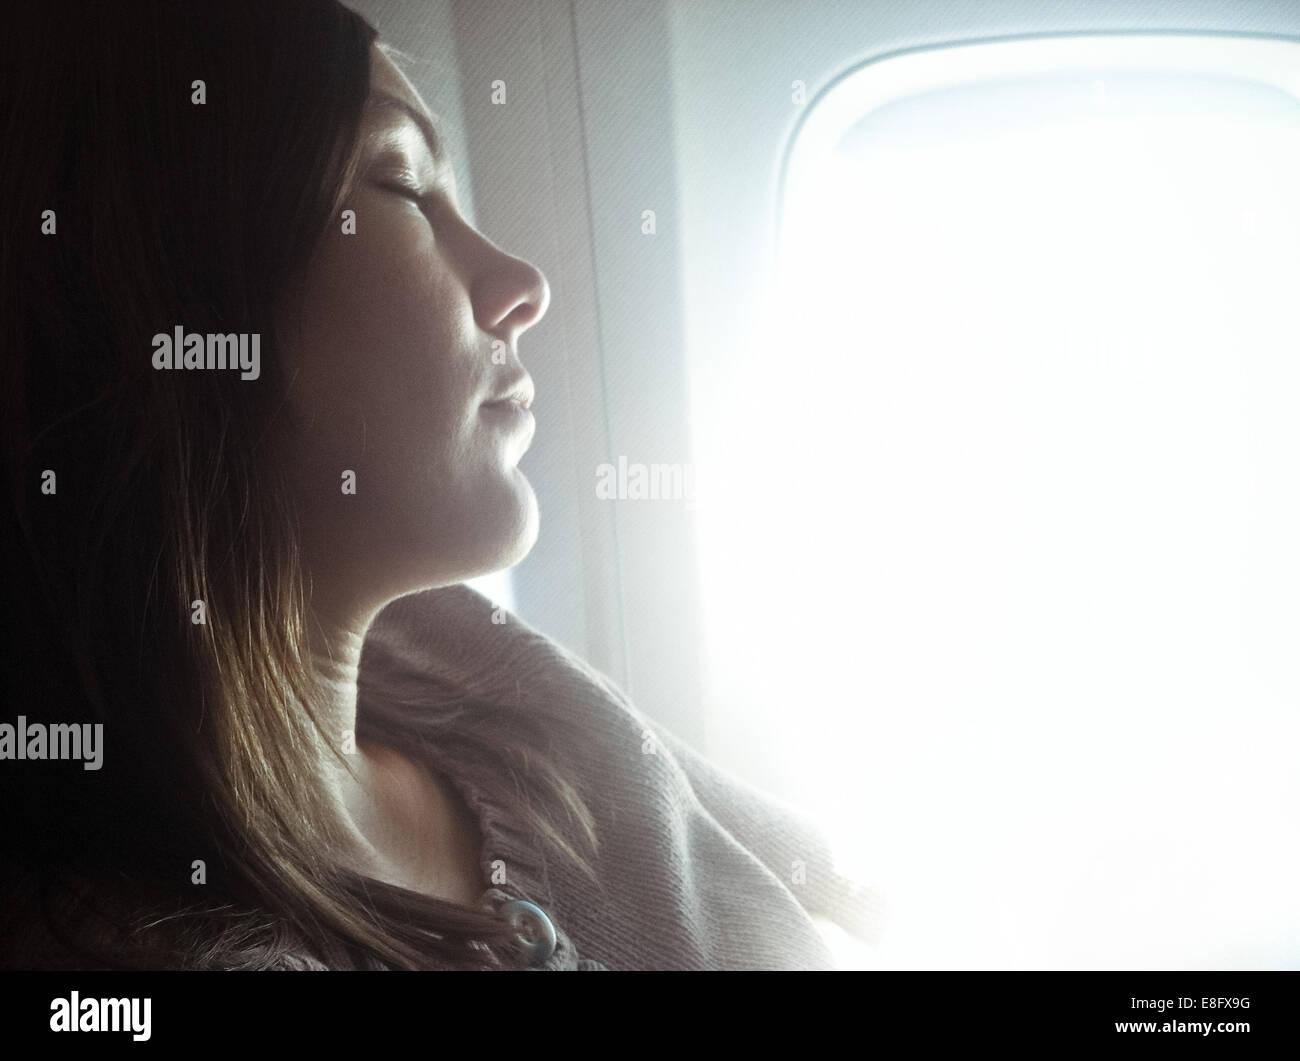 USA, Colorado, Denver County, Denver, View of woman sleeping on plane - Stock Image